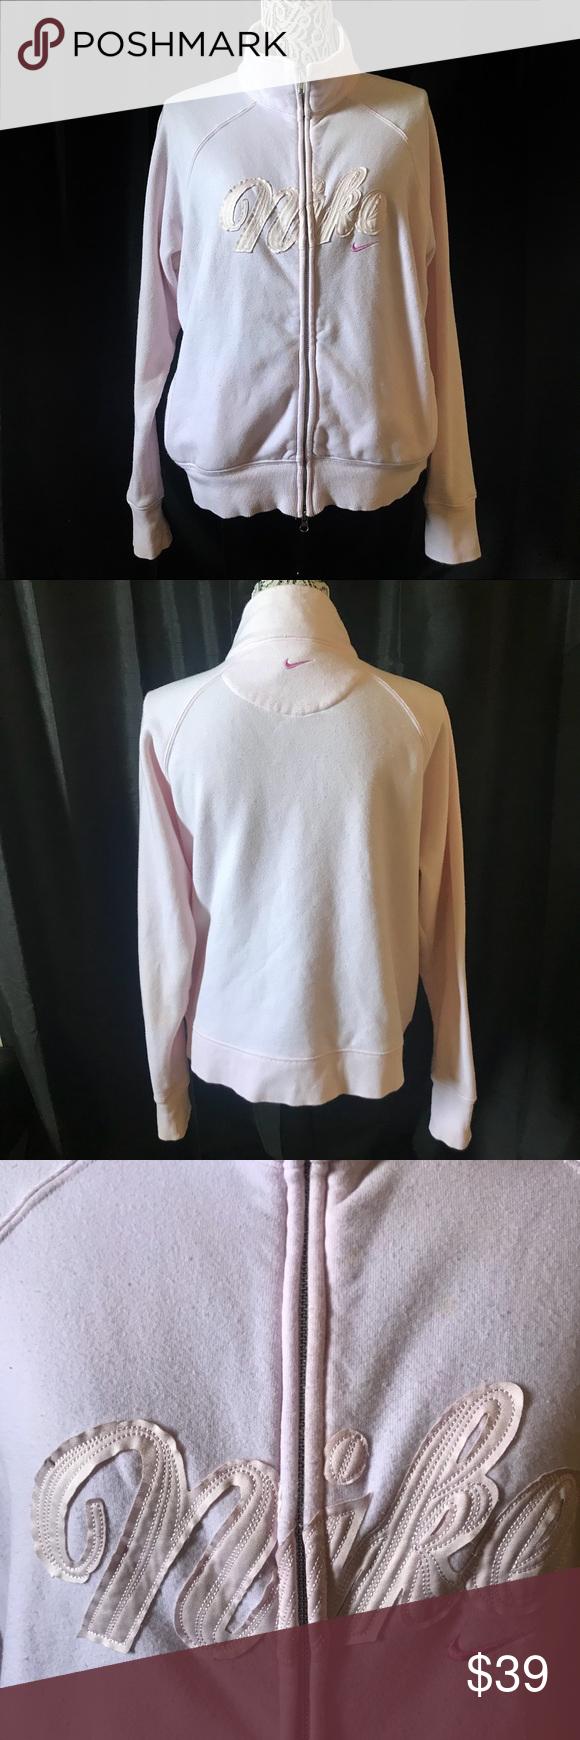 Nike Blush Millennial Pink Zip Up Sweatshirt Xl Nike Blush Millennial Pink Zip Up Sweatshirt Xl Has A Little Bit Of Stain On Pink Zip Ups Zip Ups Nike Women [ 1740 x 580 Pixel ]